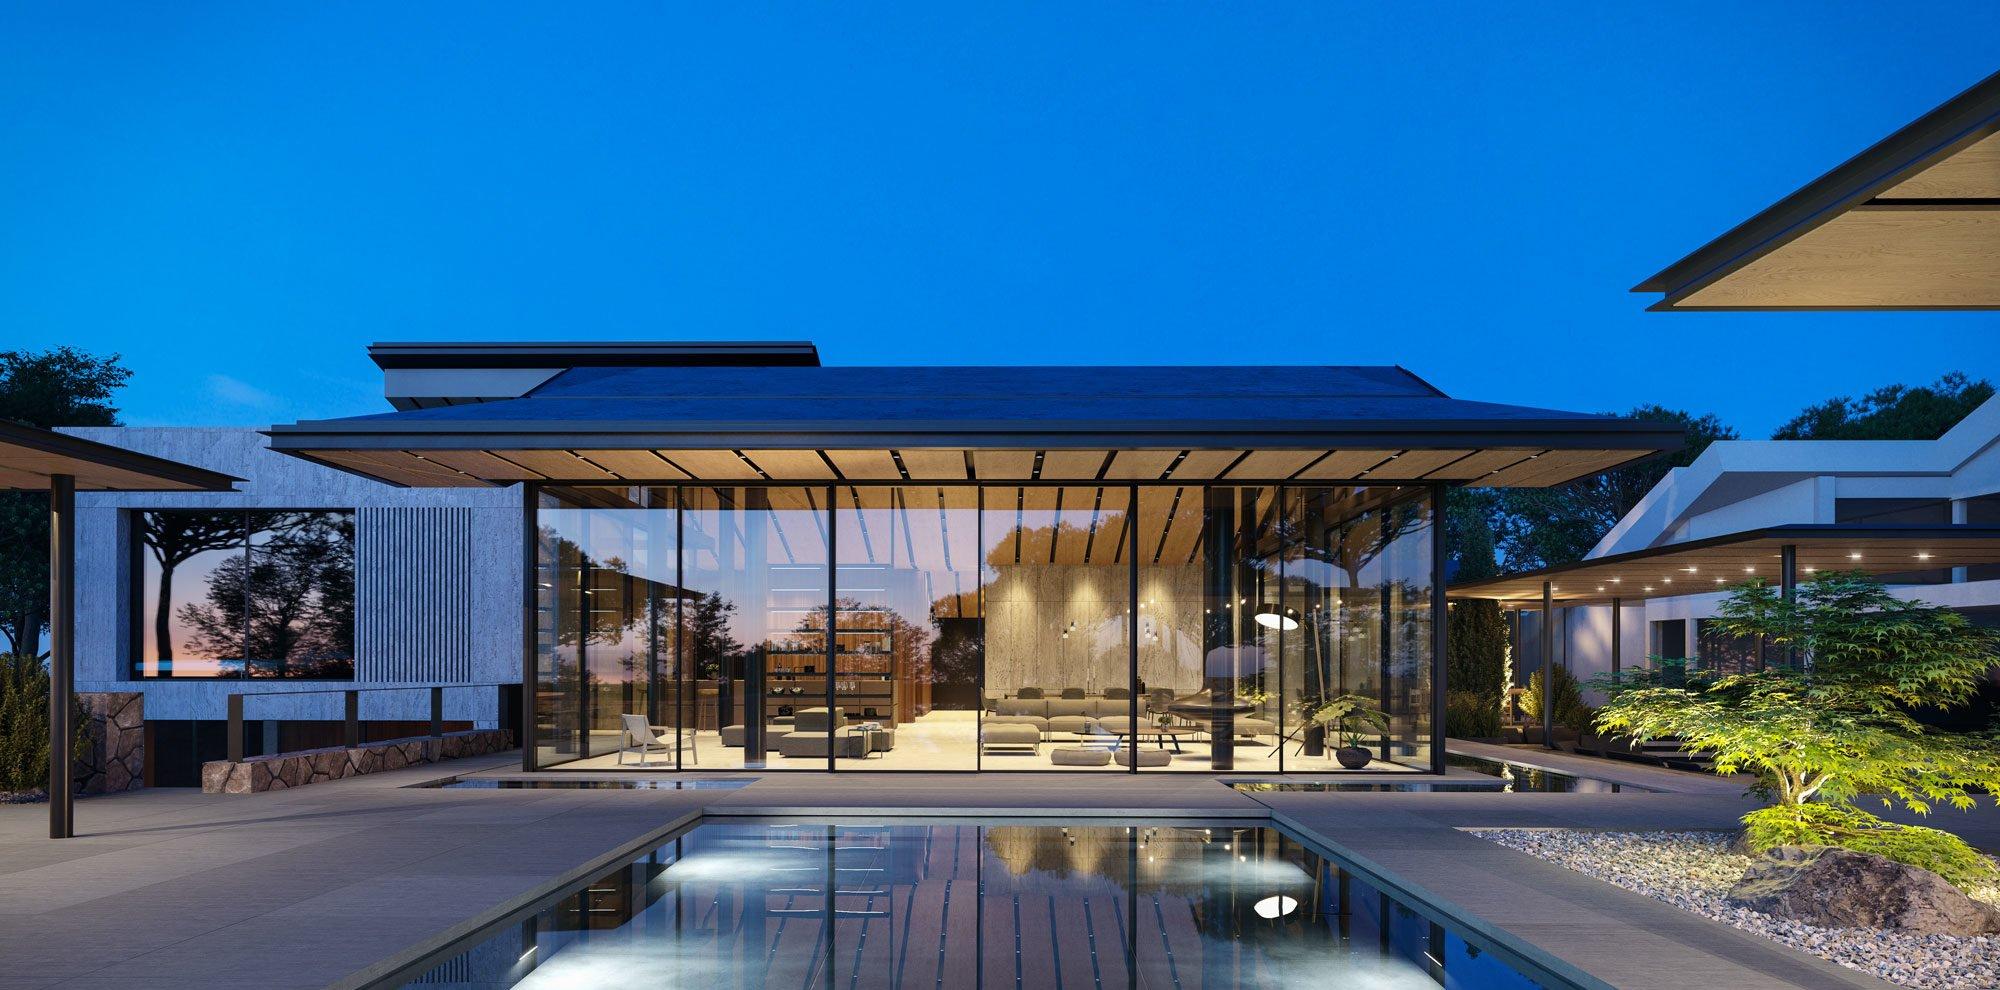 Haifa family house visualization, 500s studio